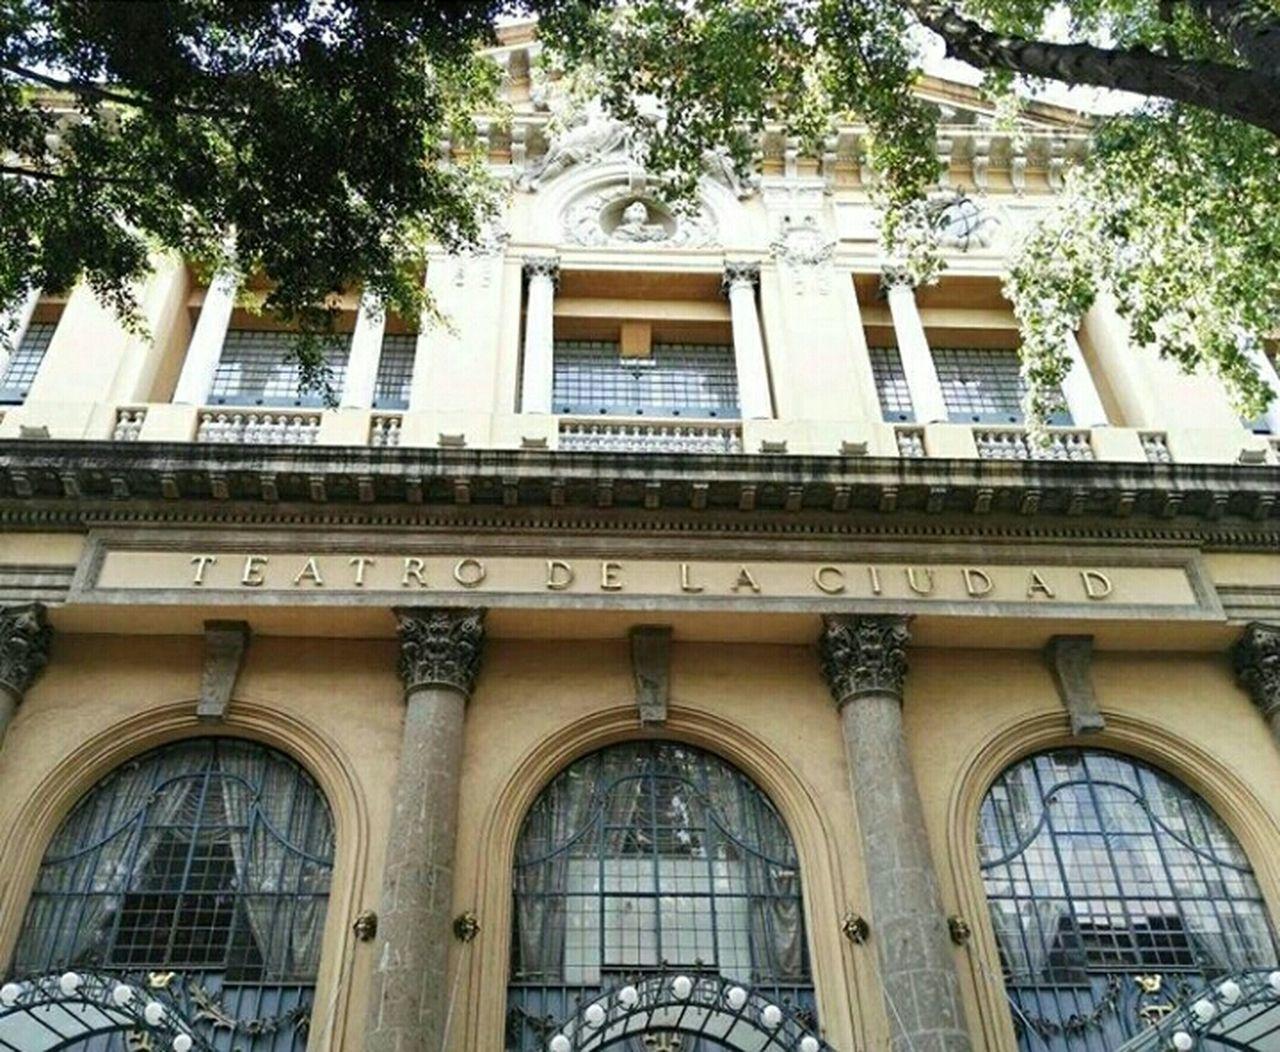 Mexico City Centro Historico TeatroDeLaCiudad Art Historical Place